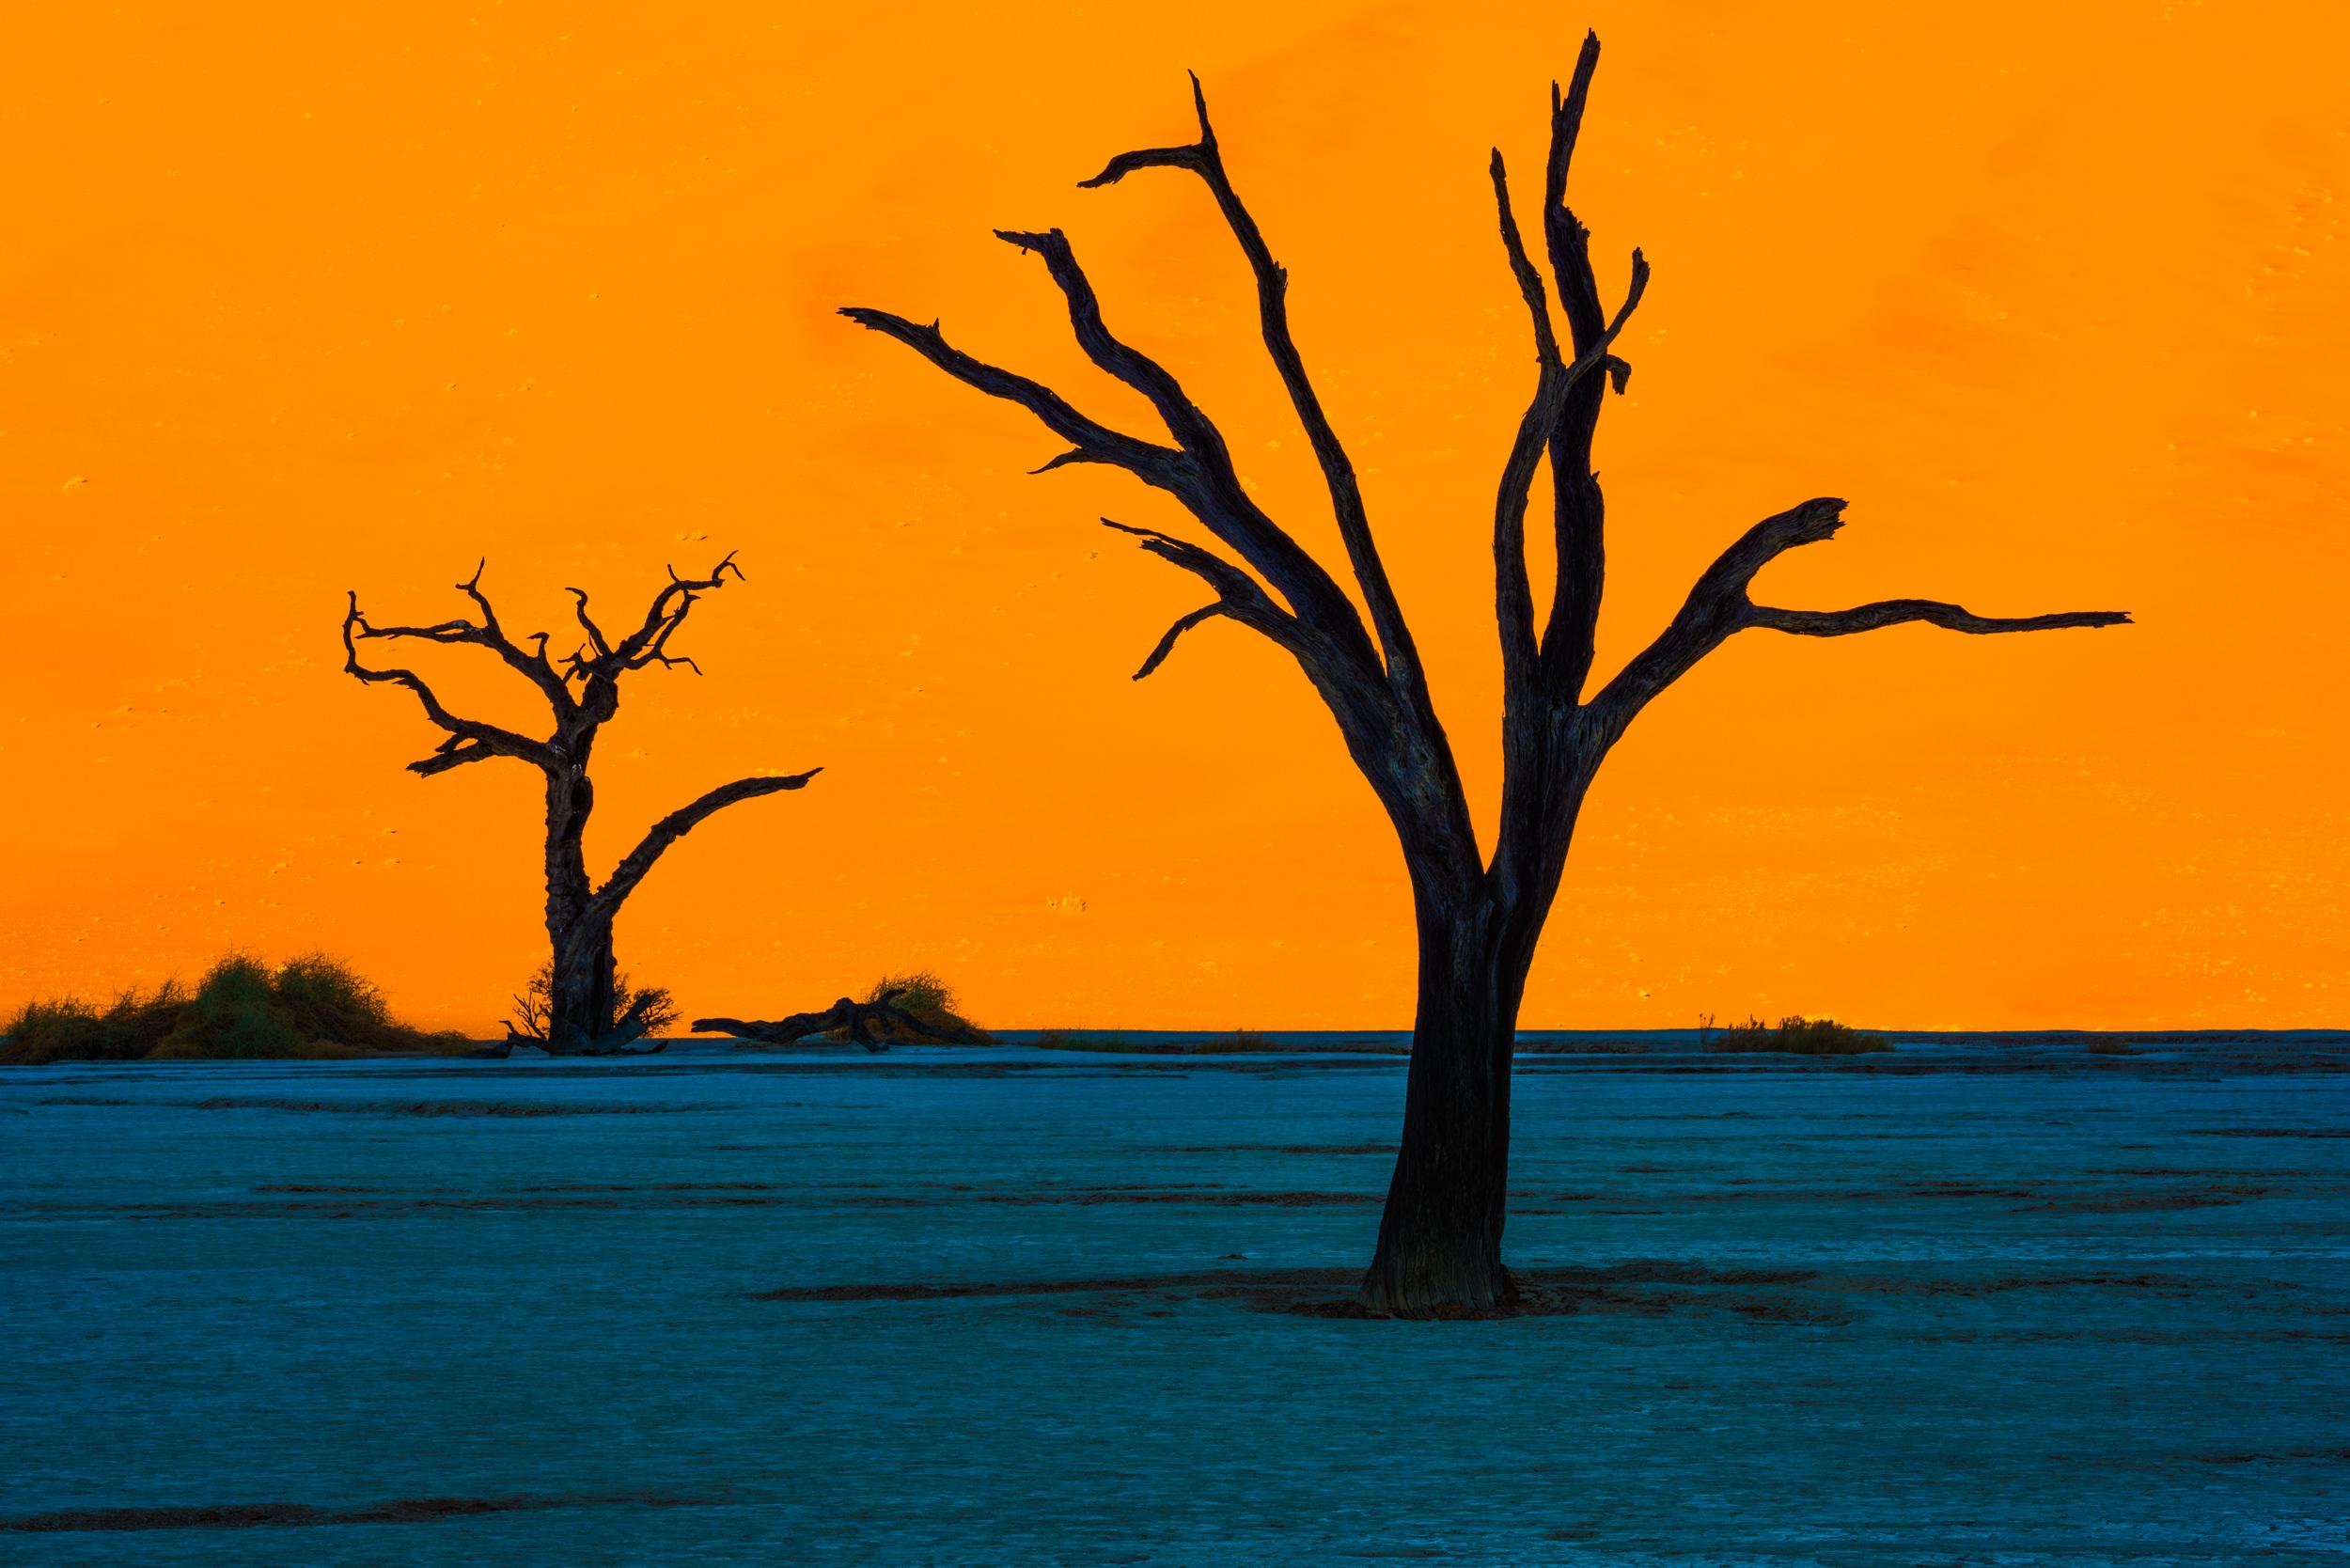 [2016 06 13] Namibia Sossusvlei (NIKON D810) 1579.jpg